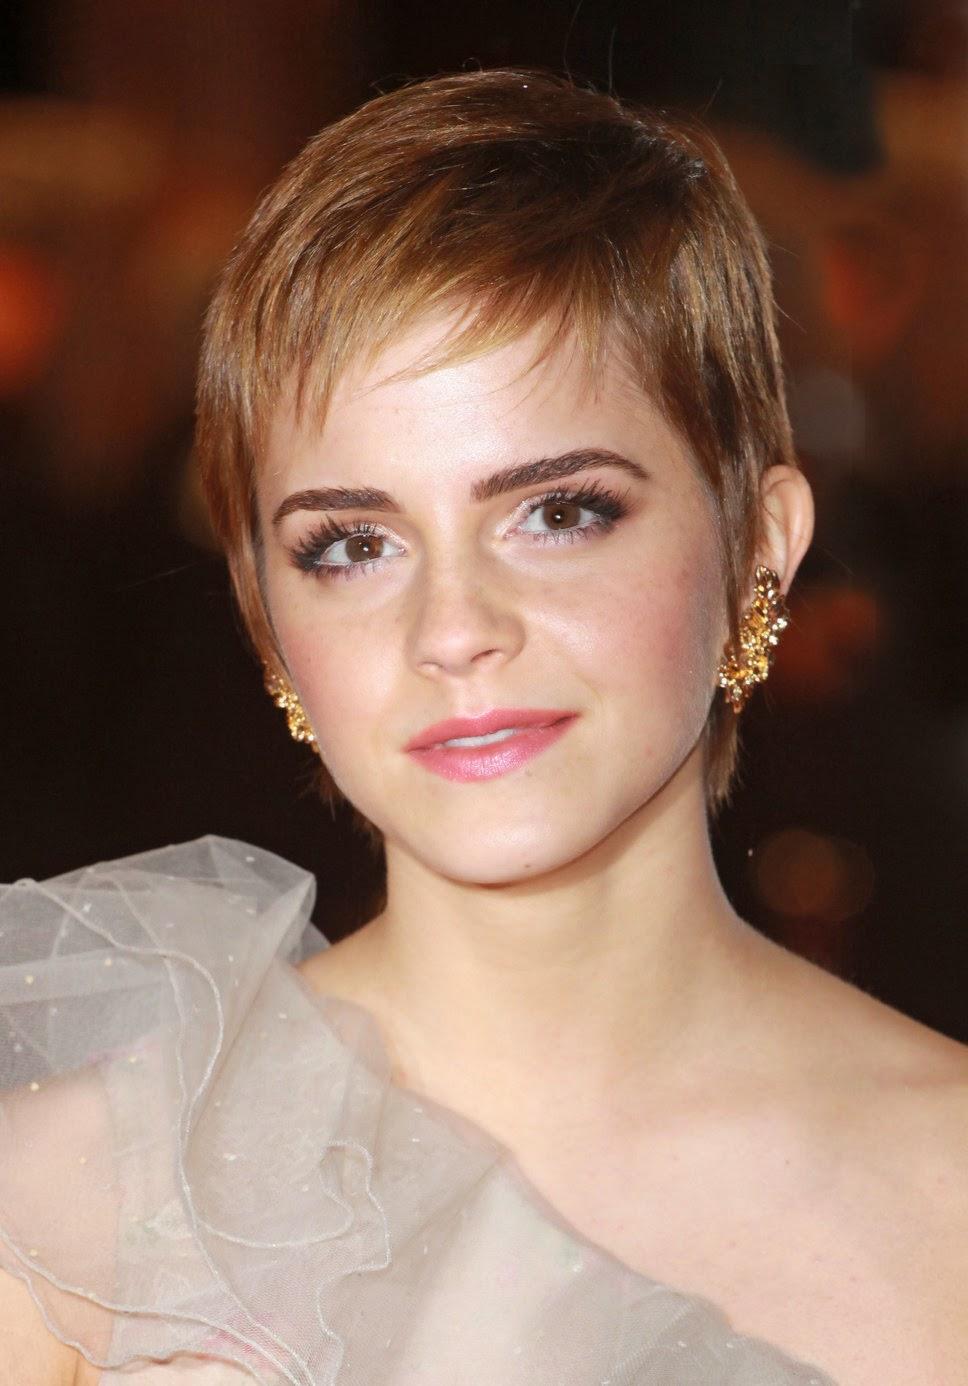 Cortes Para Pelo Fino - Pelo fino Peinados y cortes que marcan tendencia [FOTOS